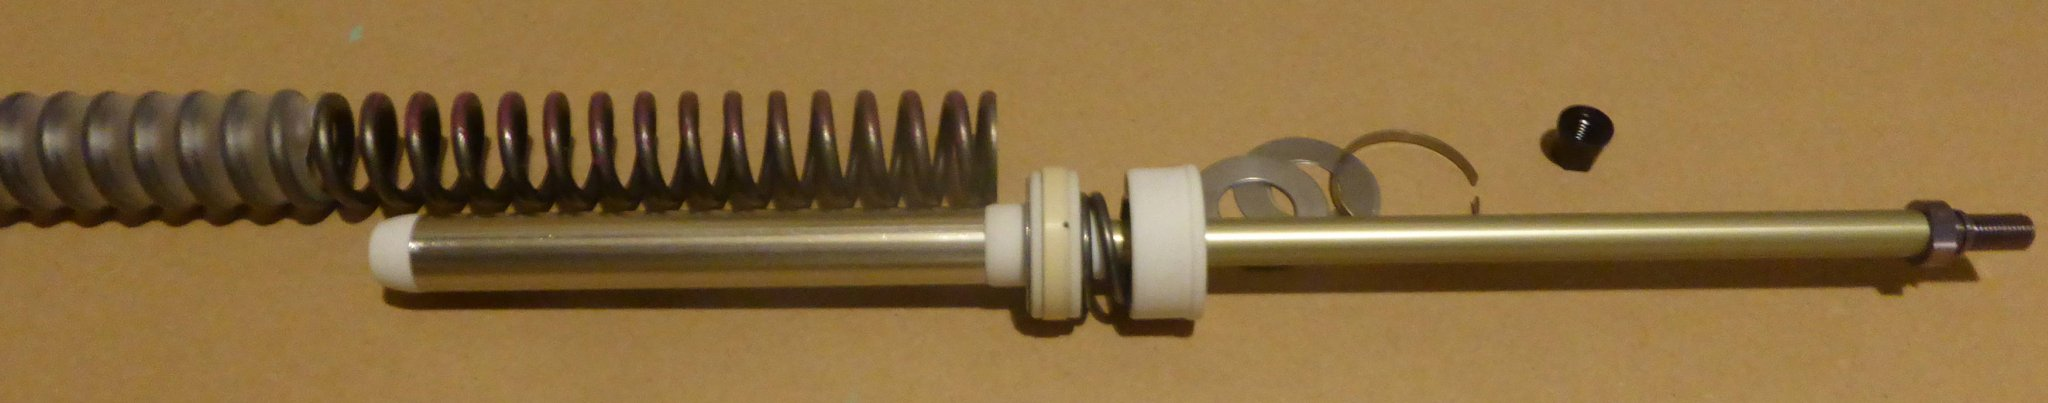 P1050743.JPG